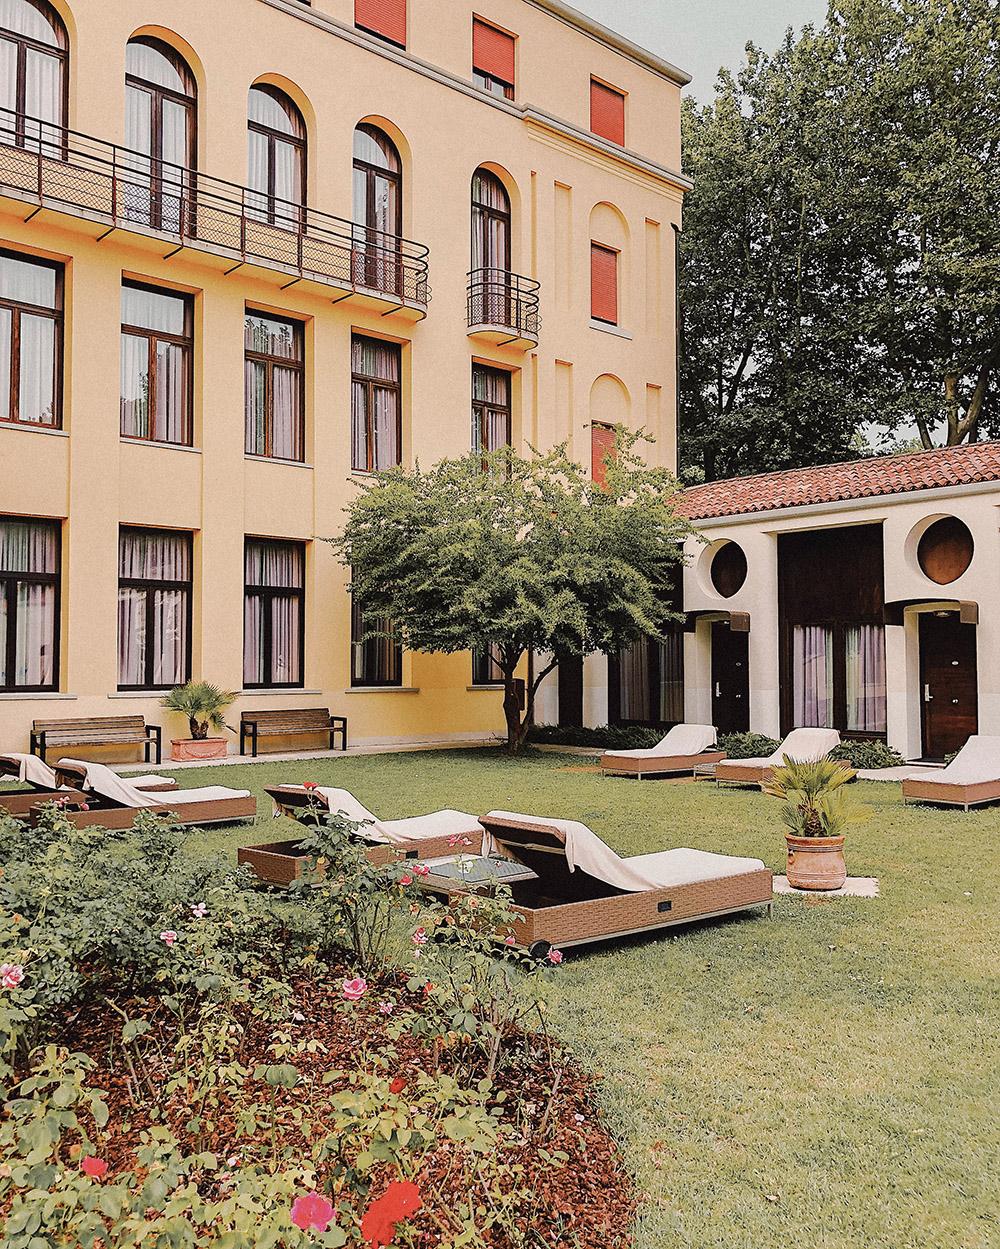 dove dormire venezia hotel giardini sant'elena 2-8